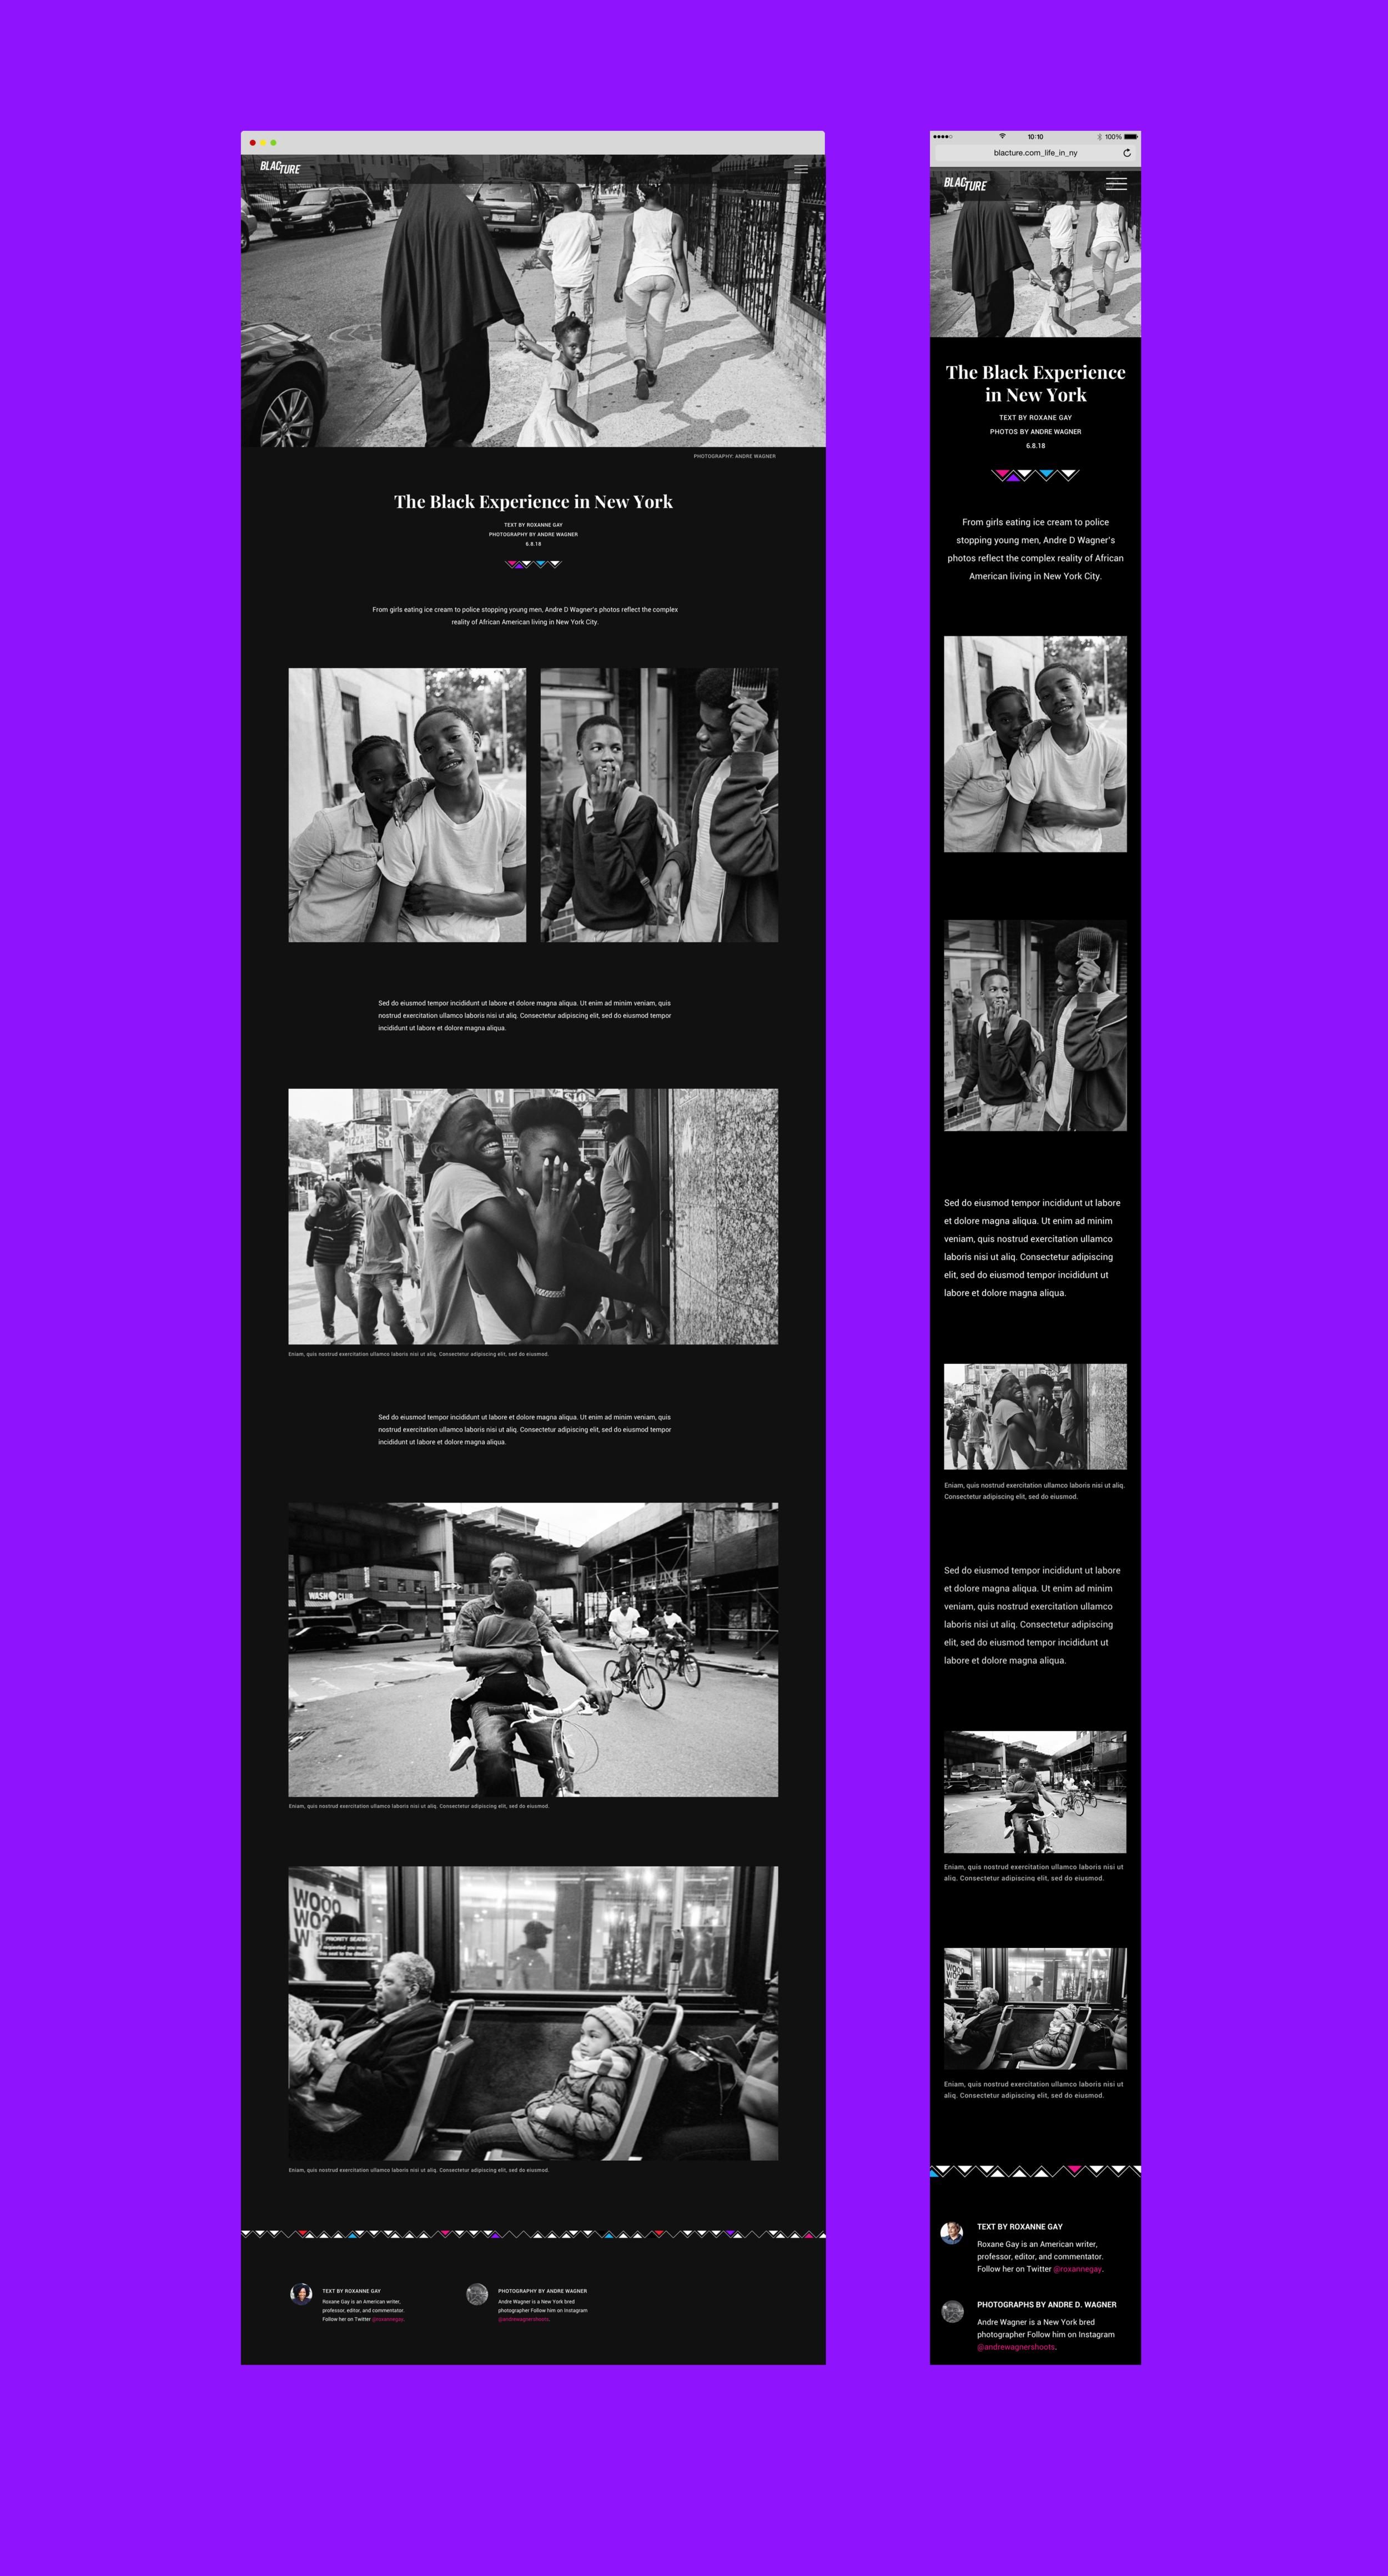 blacture_photo_essay_comp@2x.png